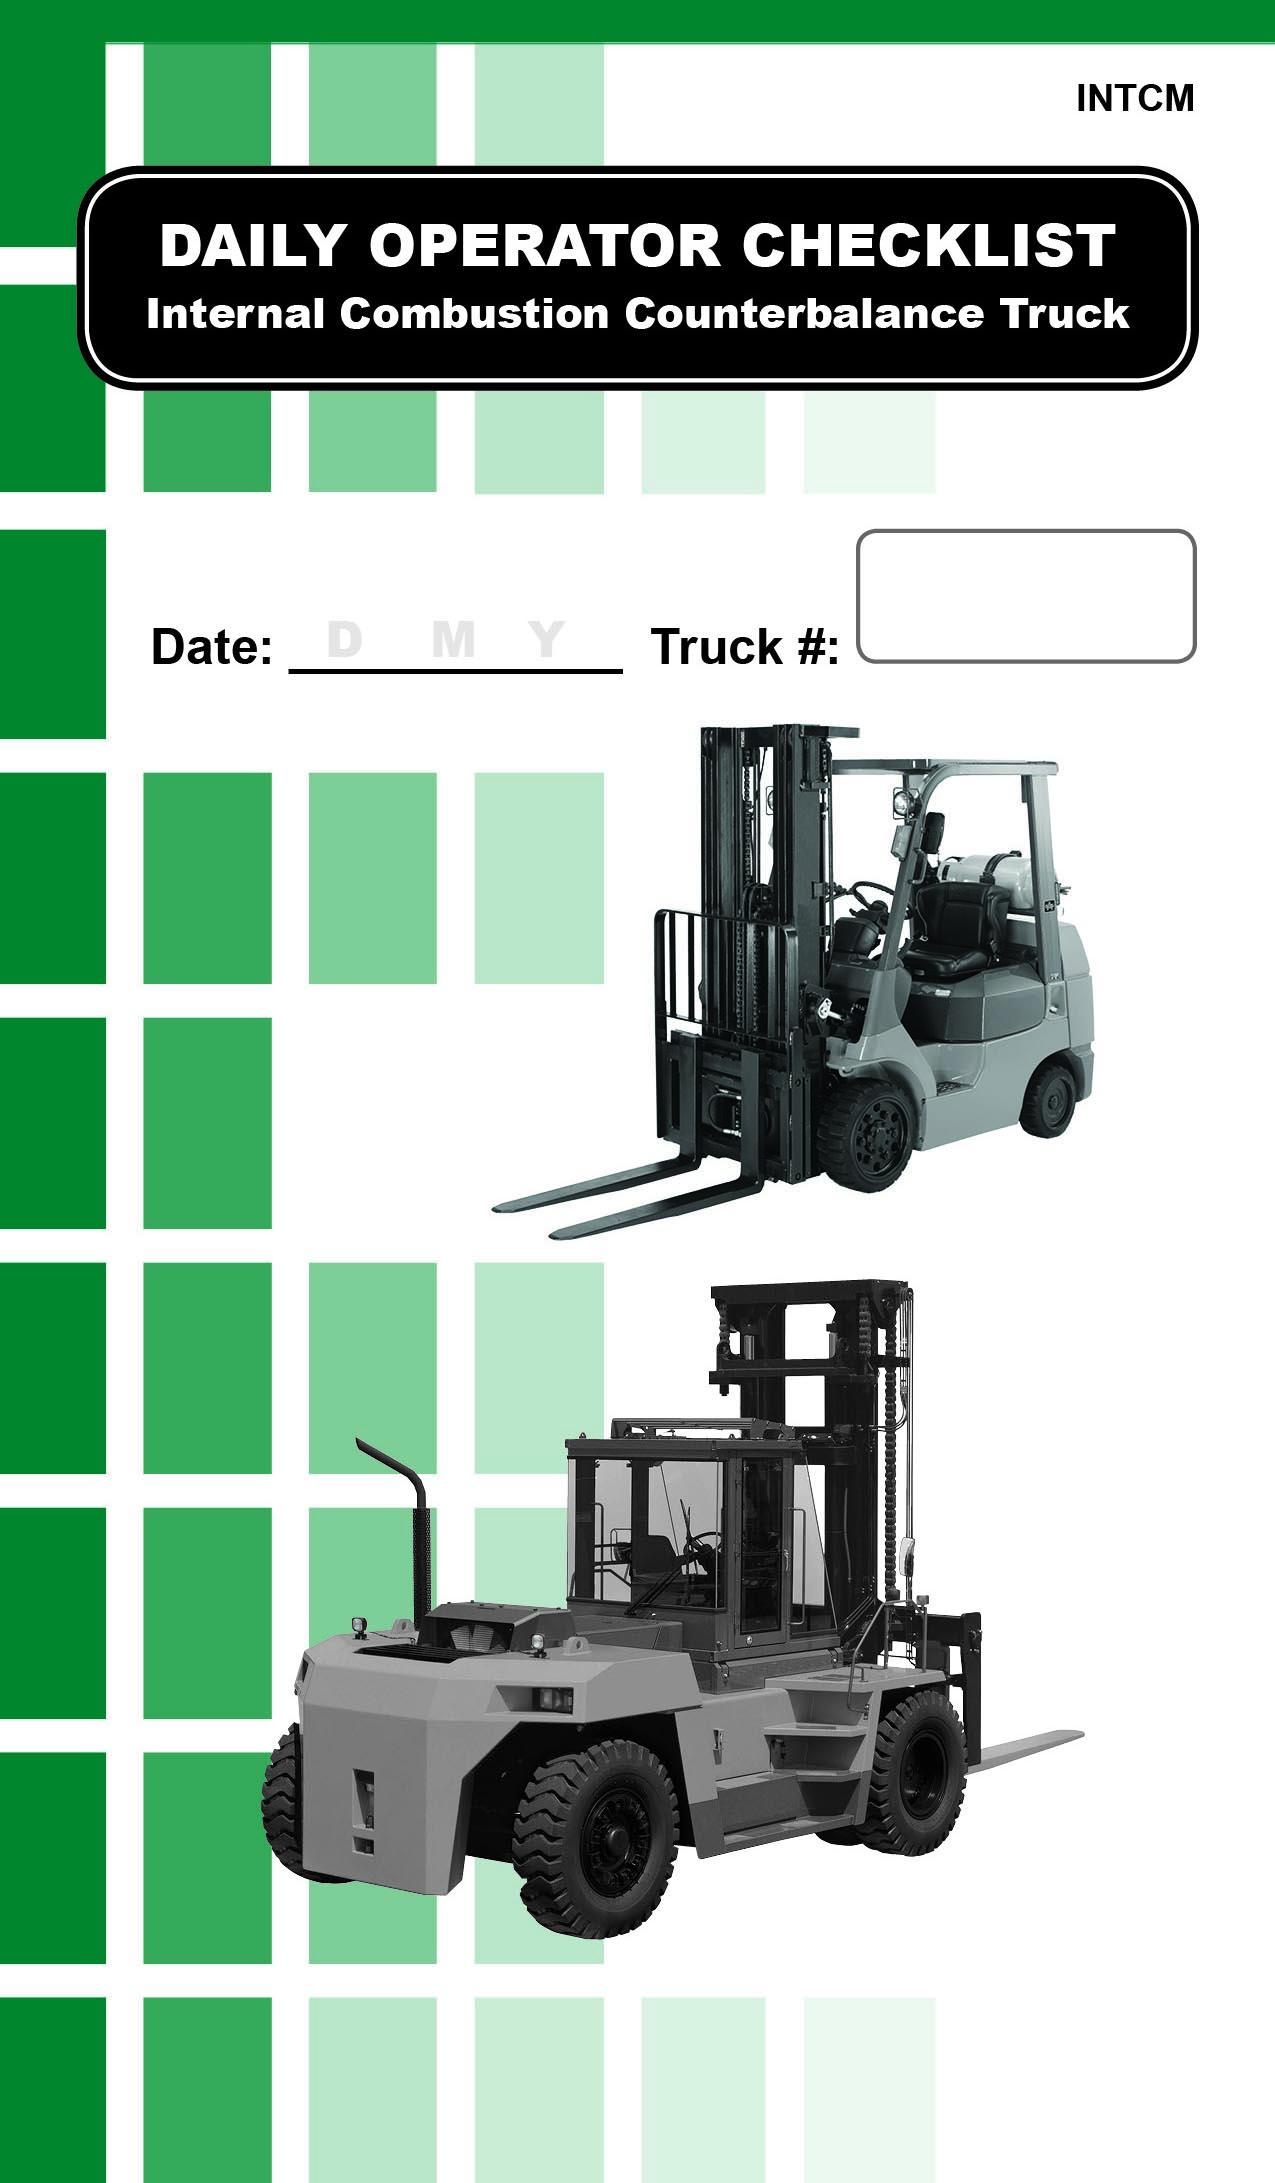 Propane Counterbalance Forklift Daily Checklist Refill